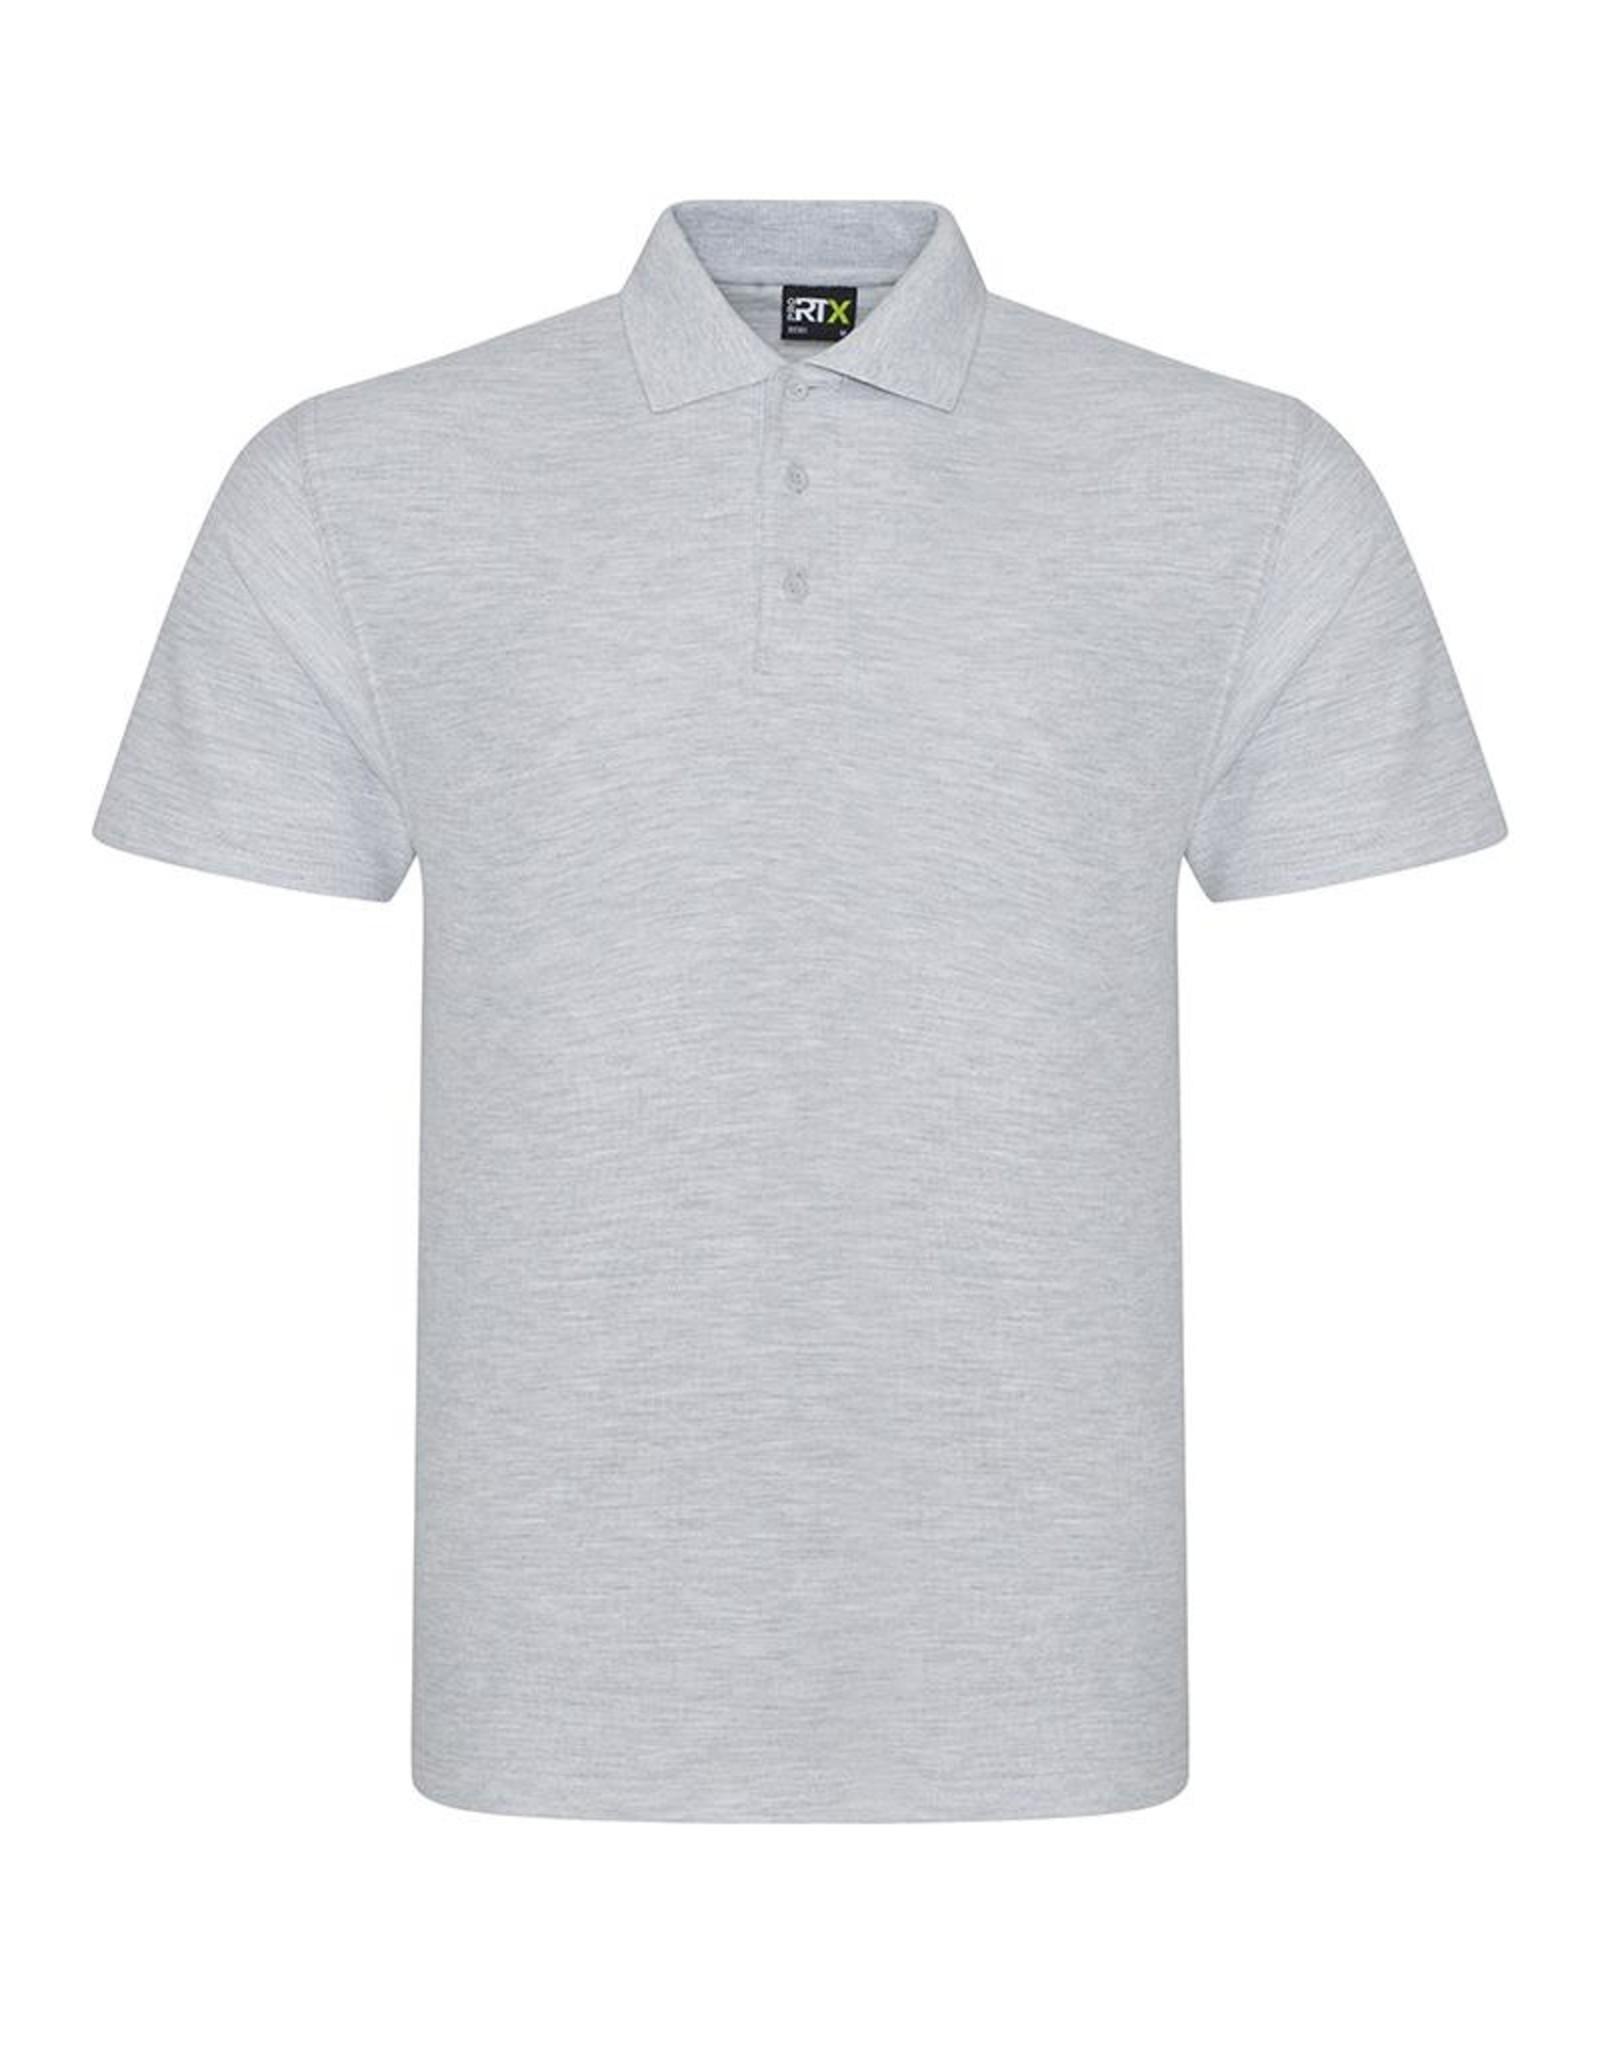 Pro RTX POLOSHIRT piqué workwear grijs